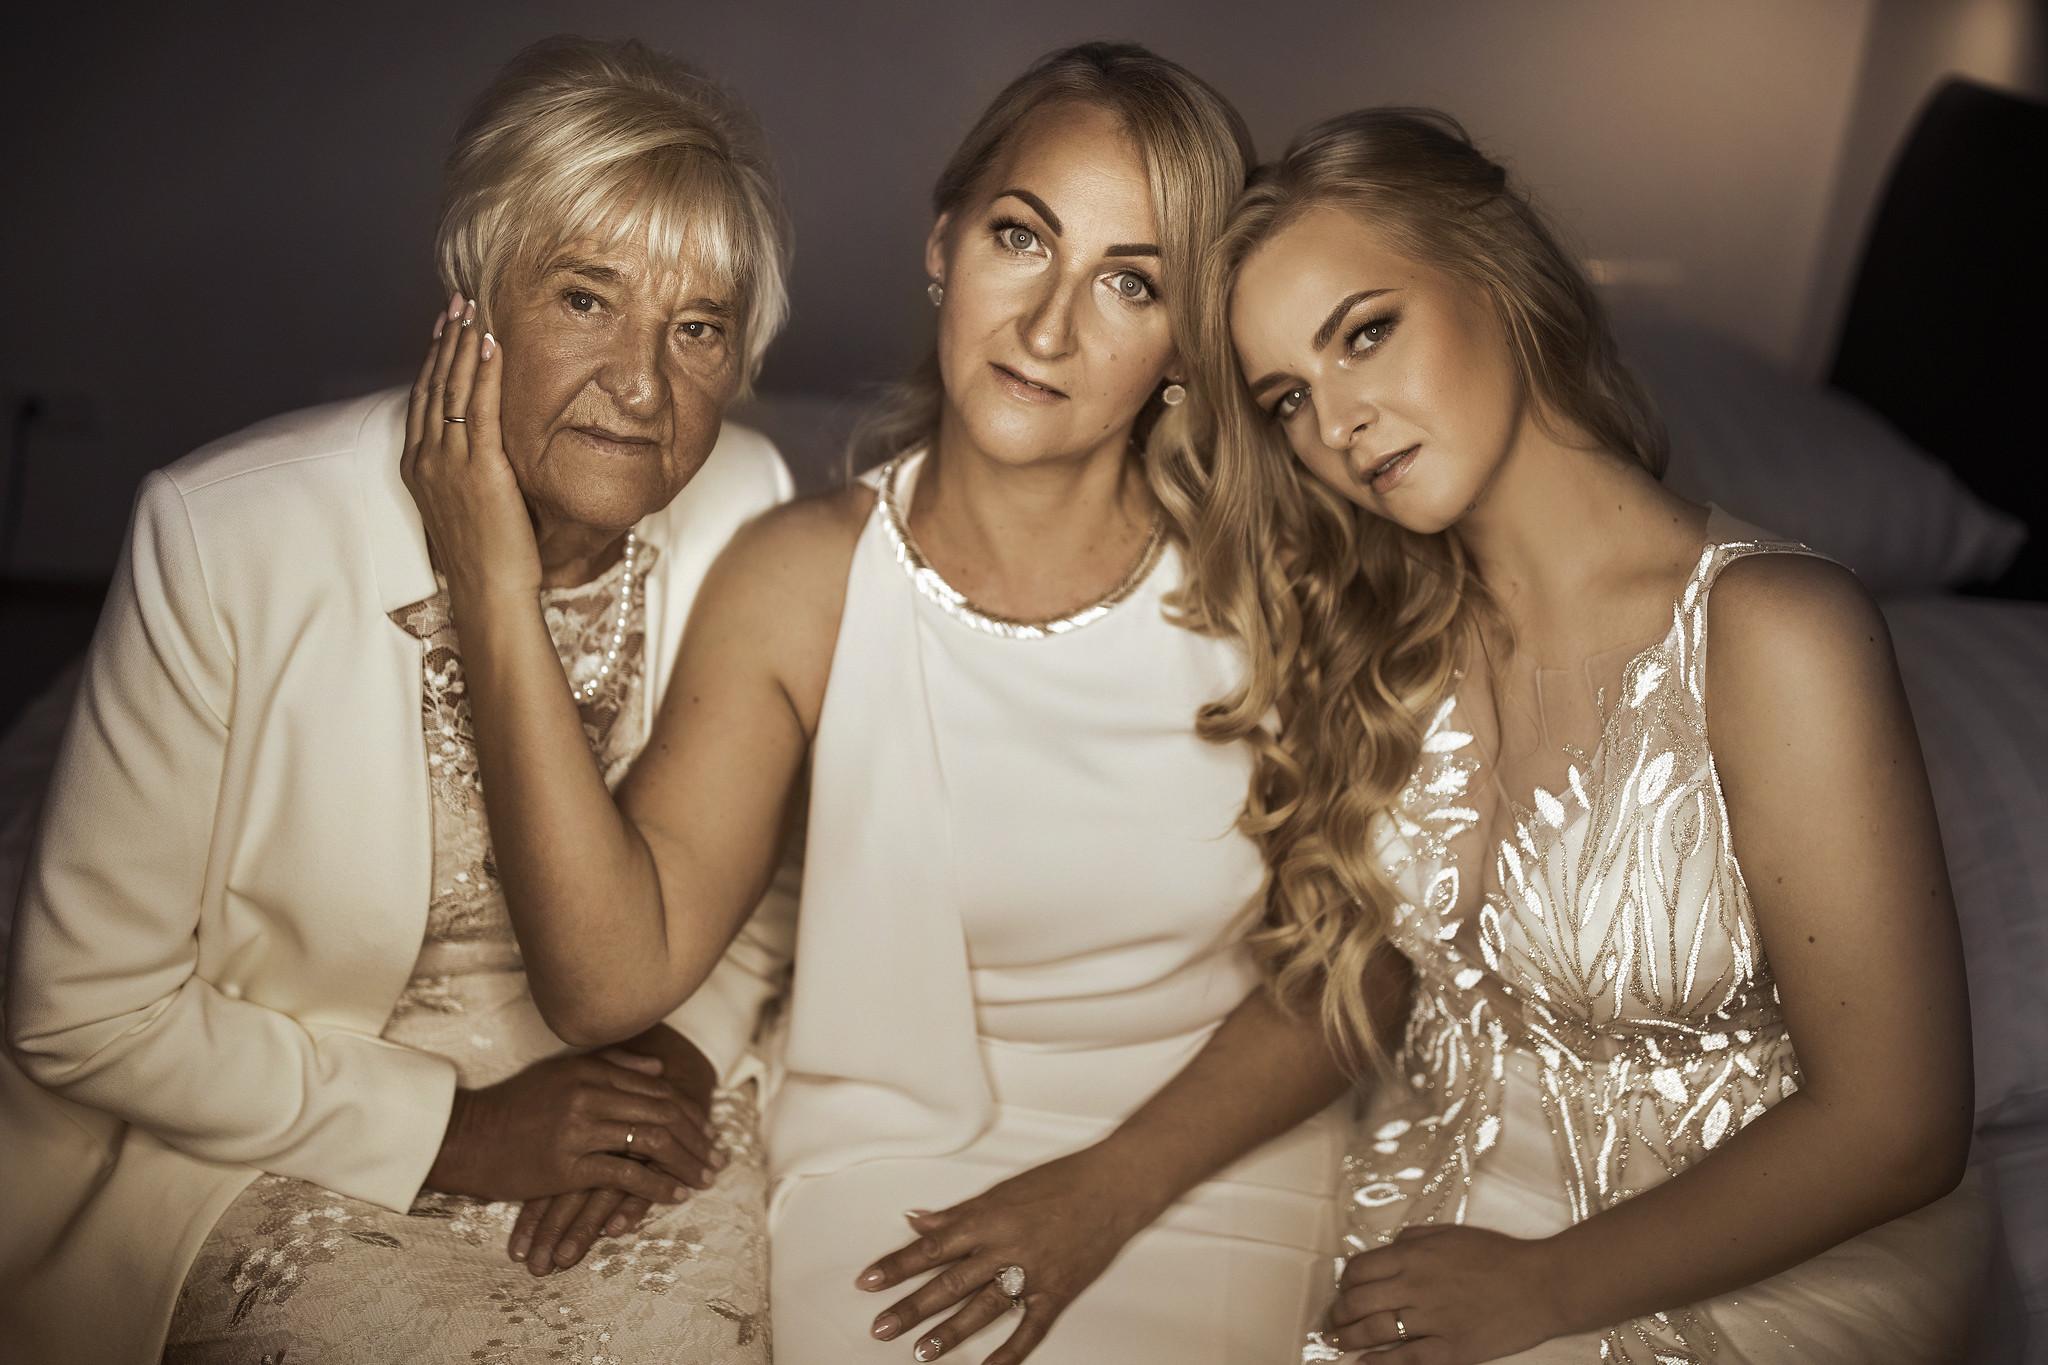 Silvija & Family...